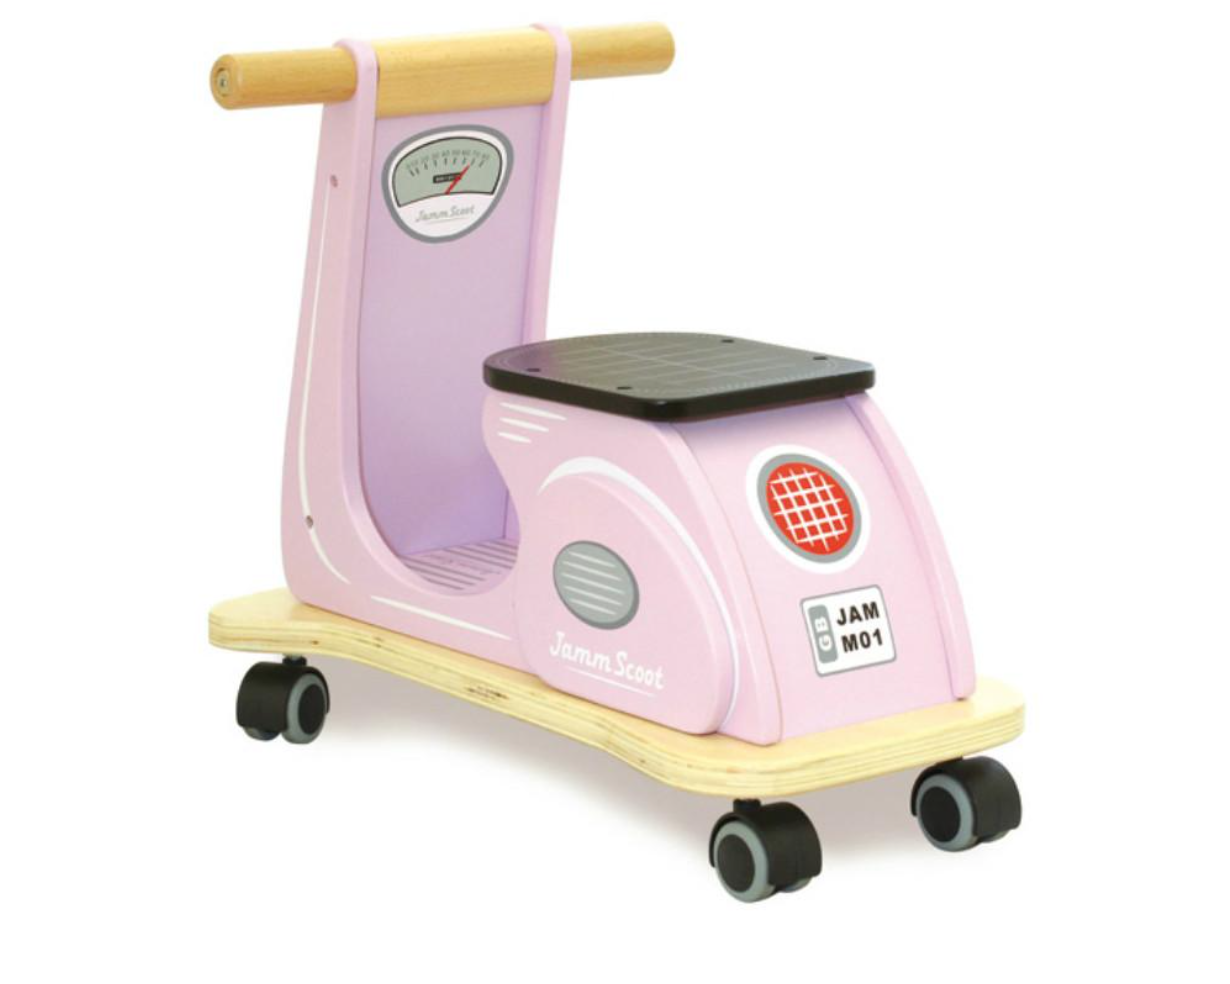 Indigo Jamm scooter